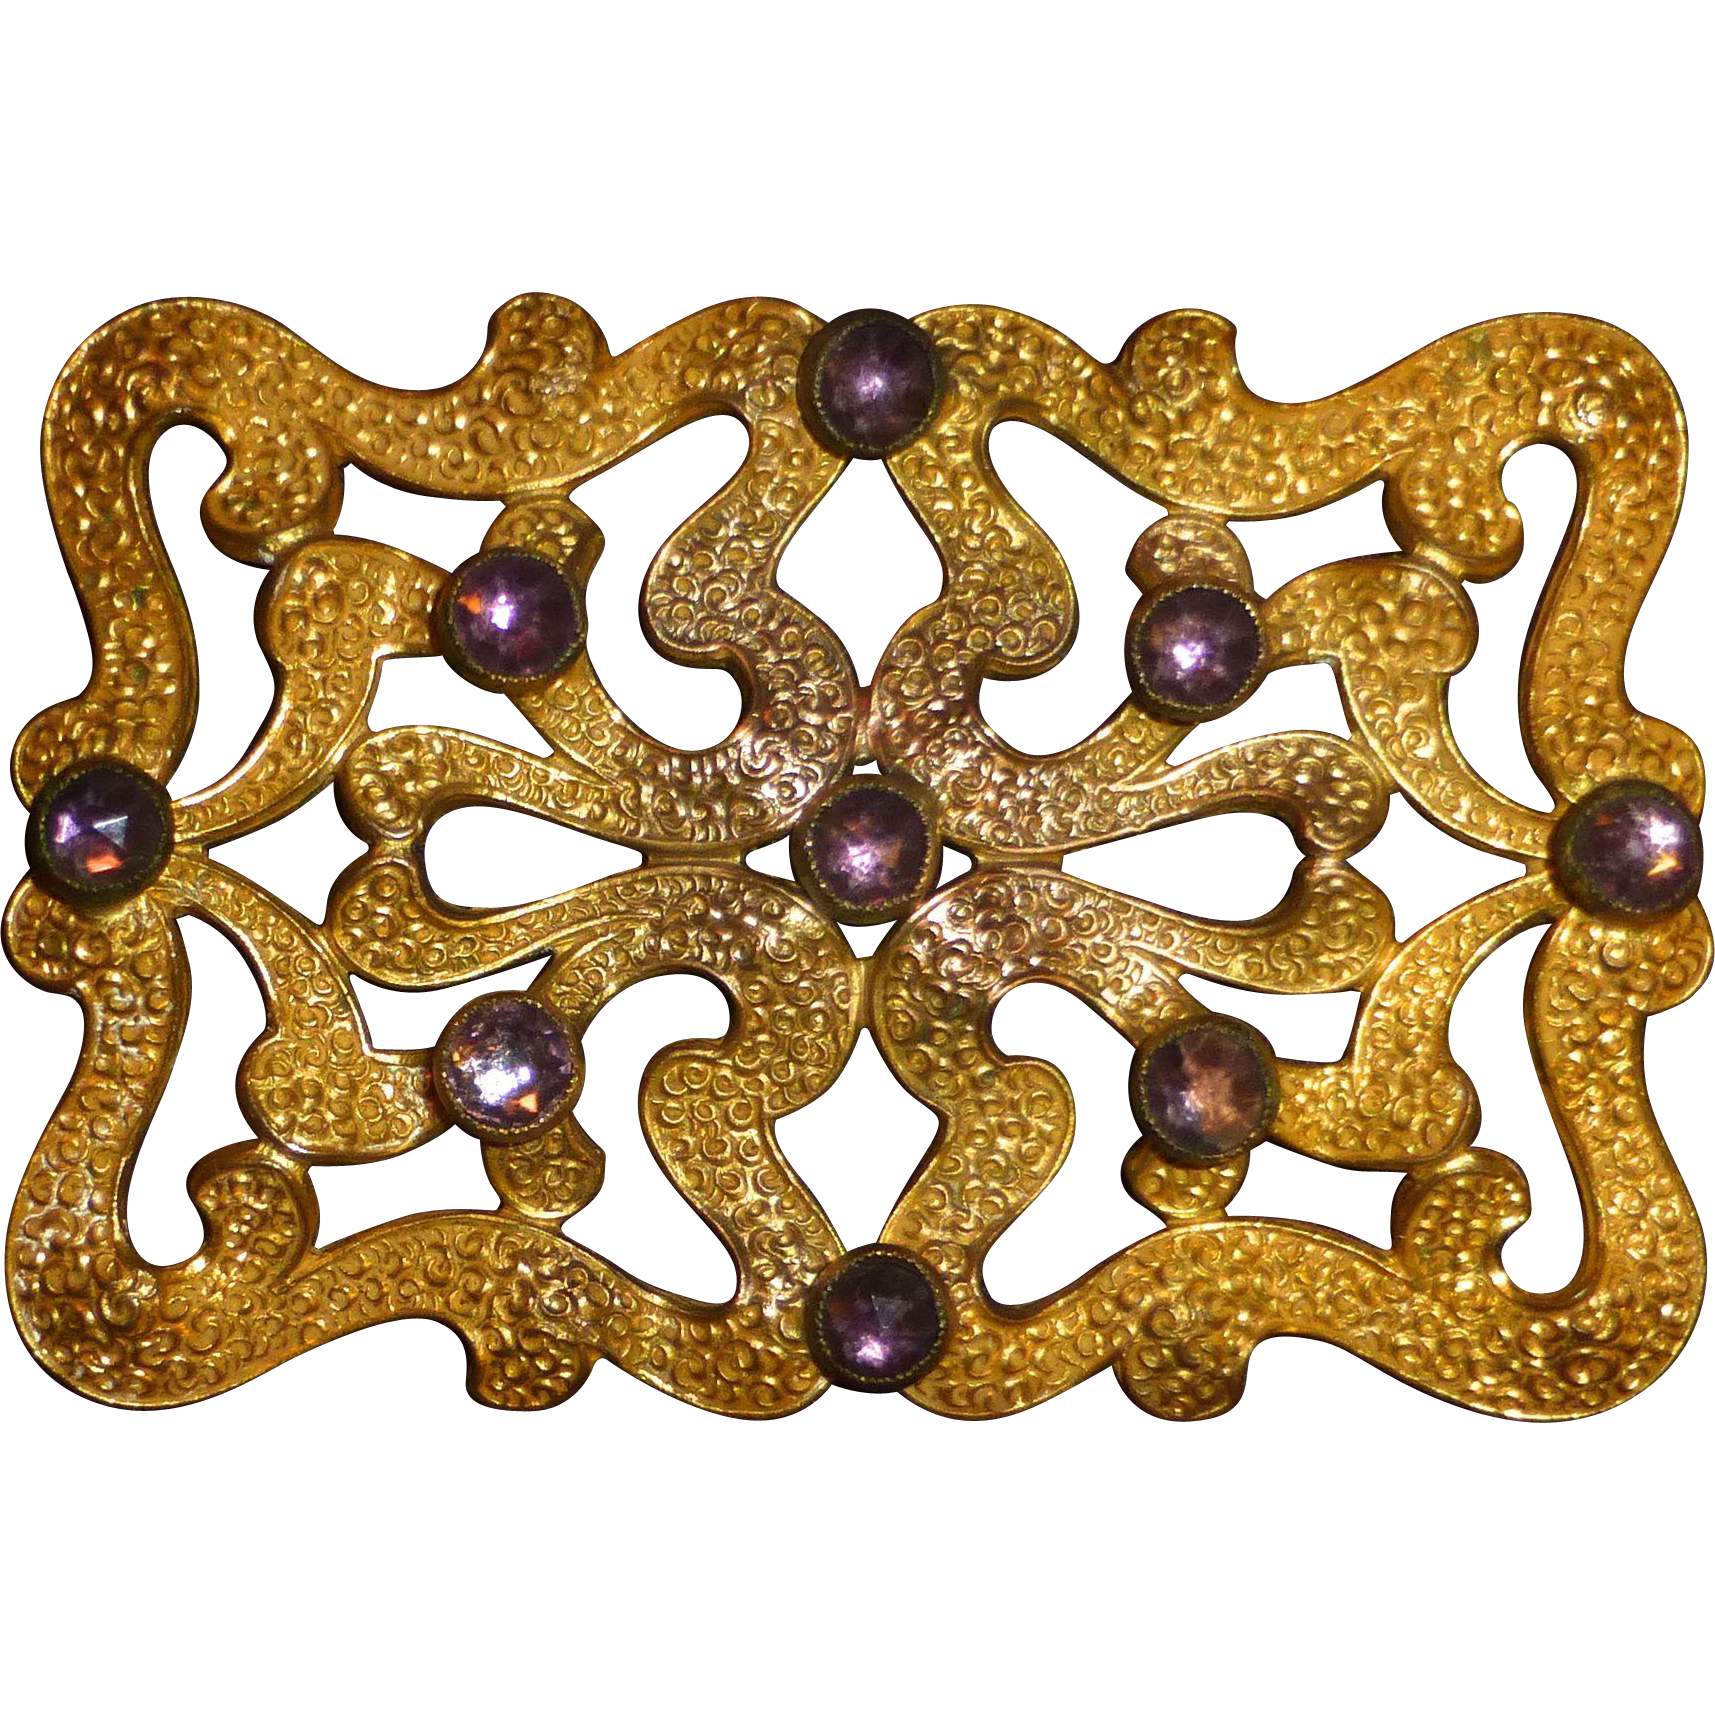 Art Deco Gilt Brass Sash Ornament Brooch